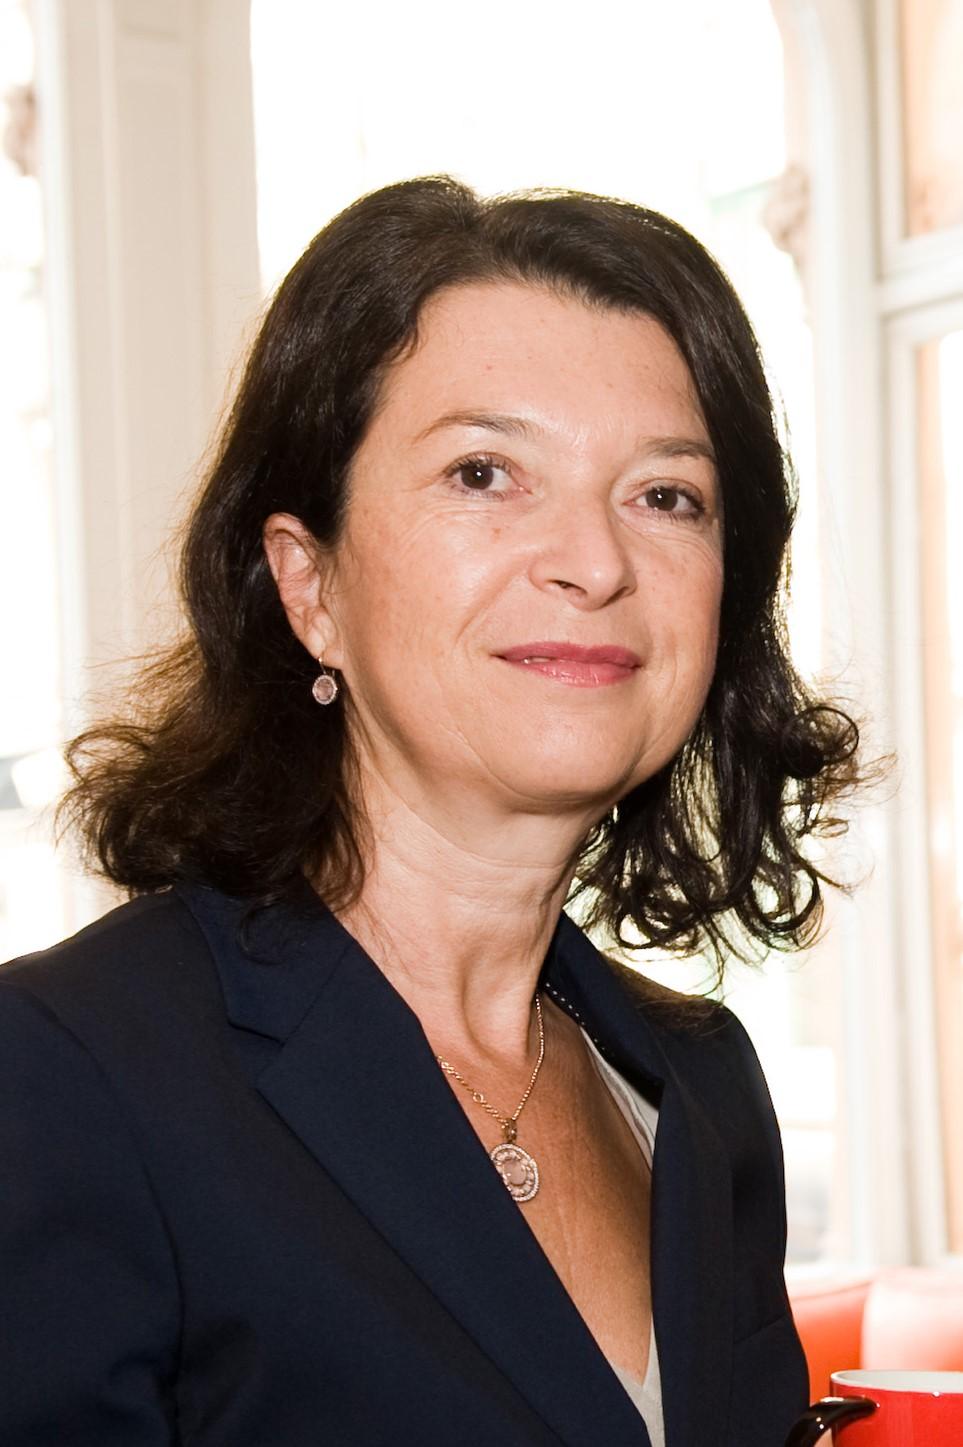 SUSANNE HÖLLINGER